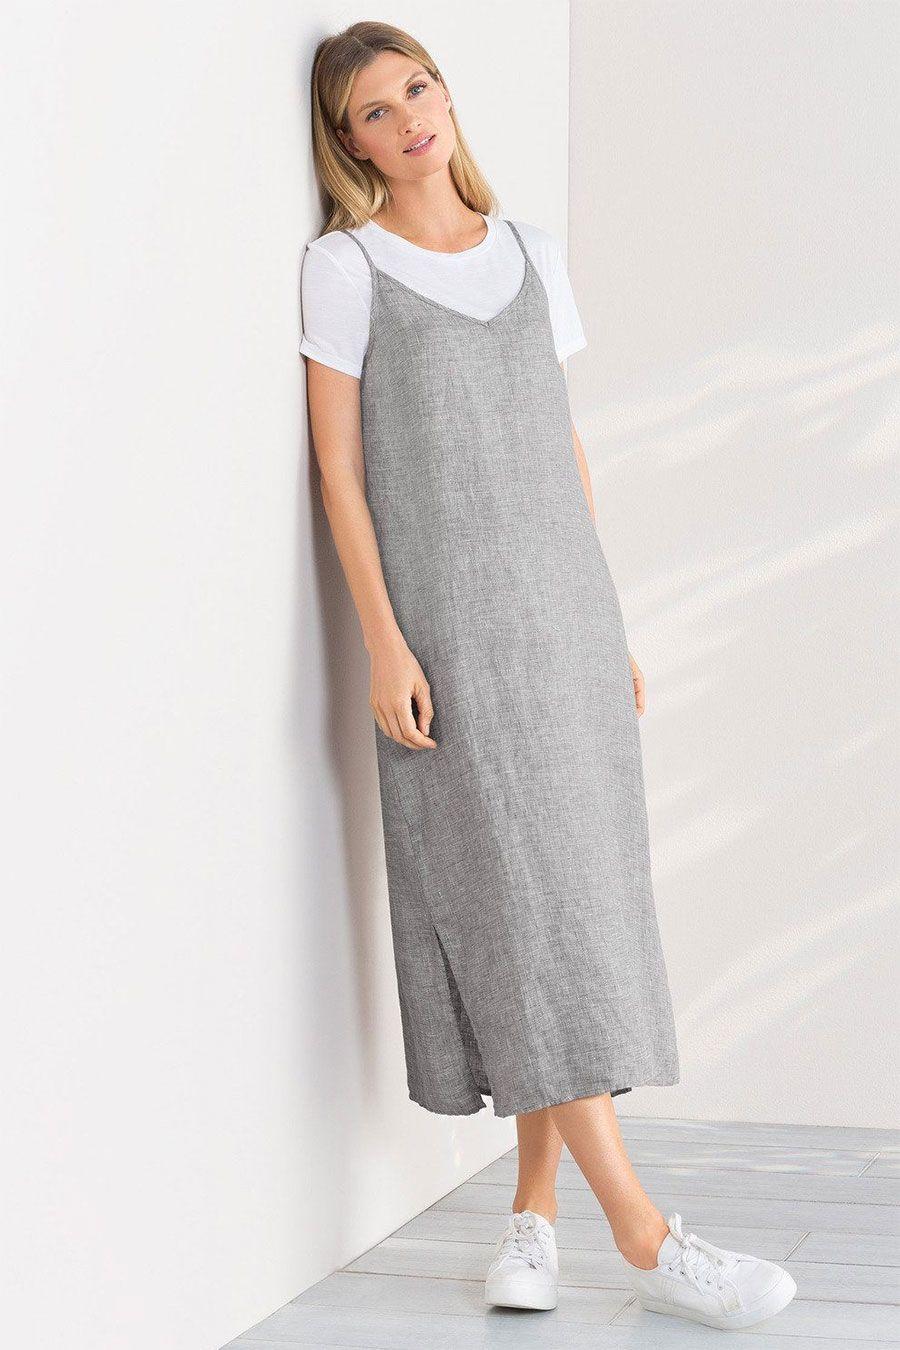 Grace Hill Linen Slip Dress